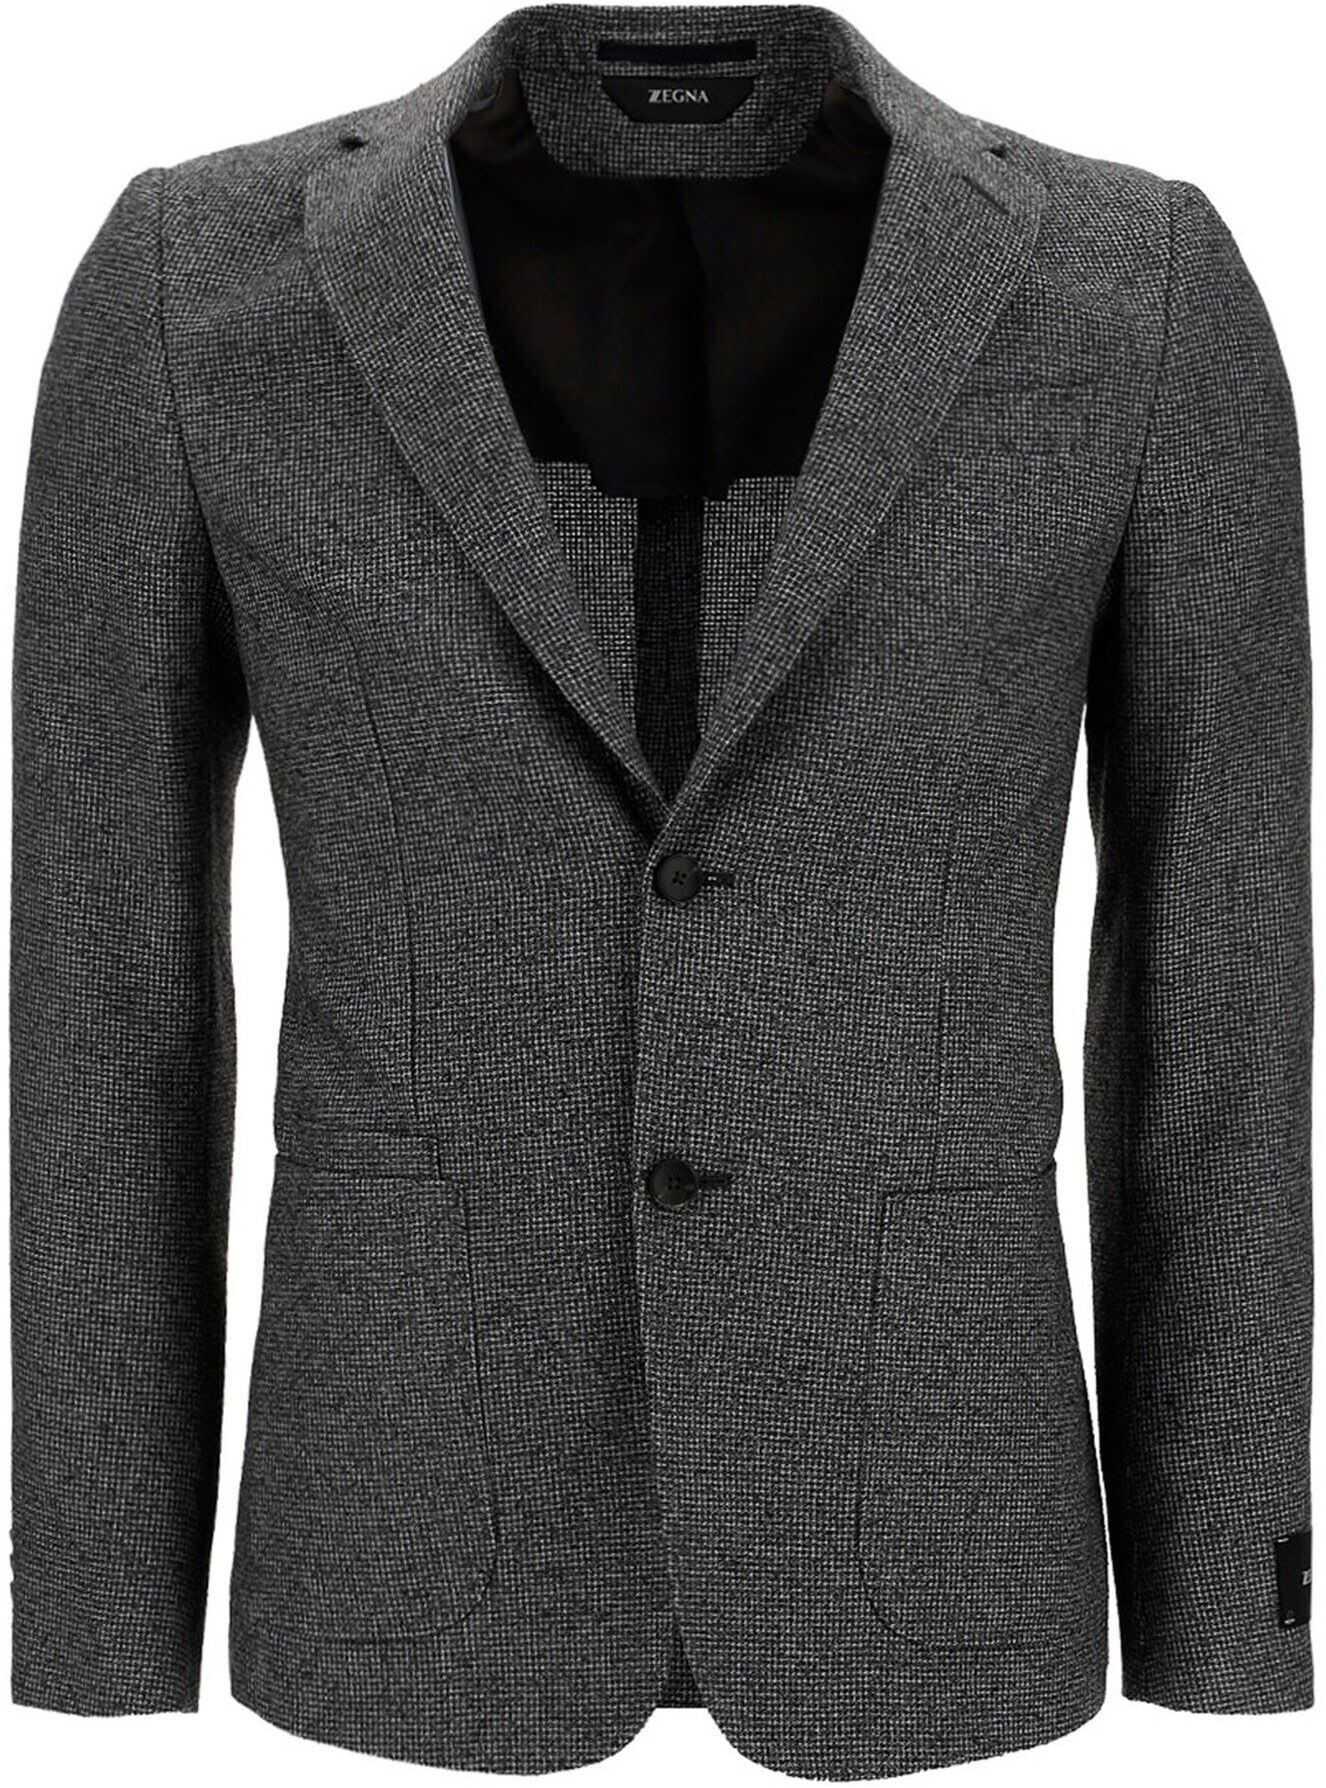 Z Zegna Viscose Blend Blazer In Grey Grey imagine